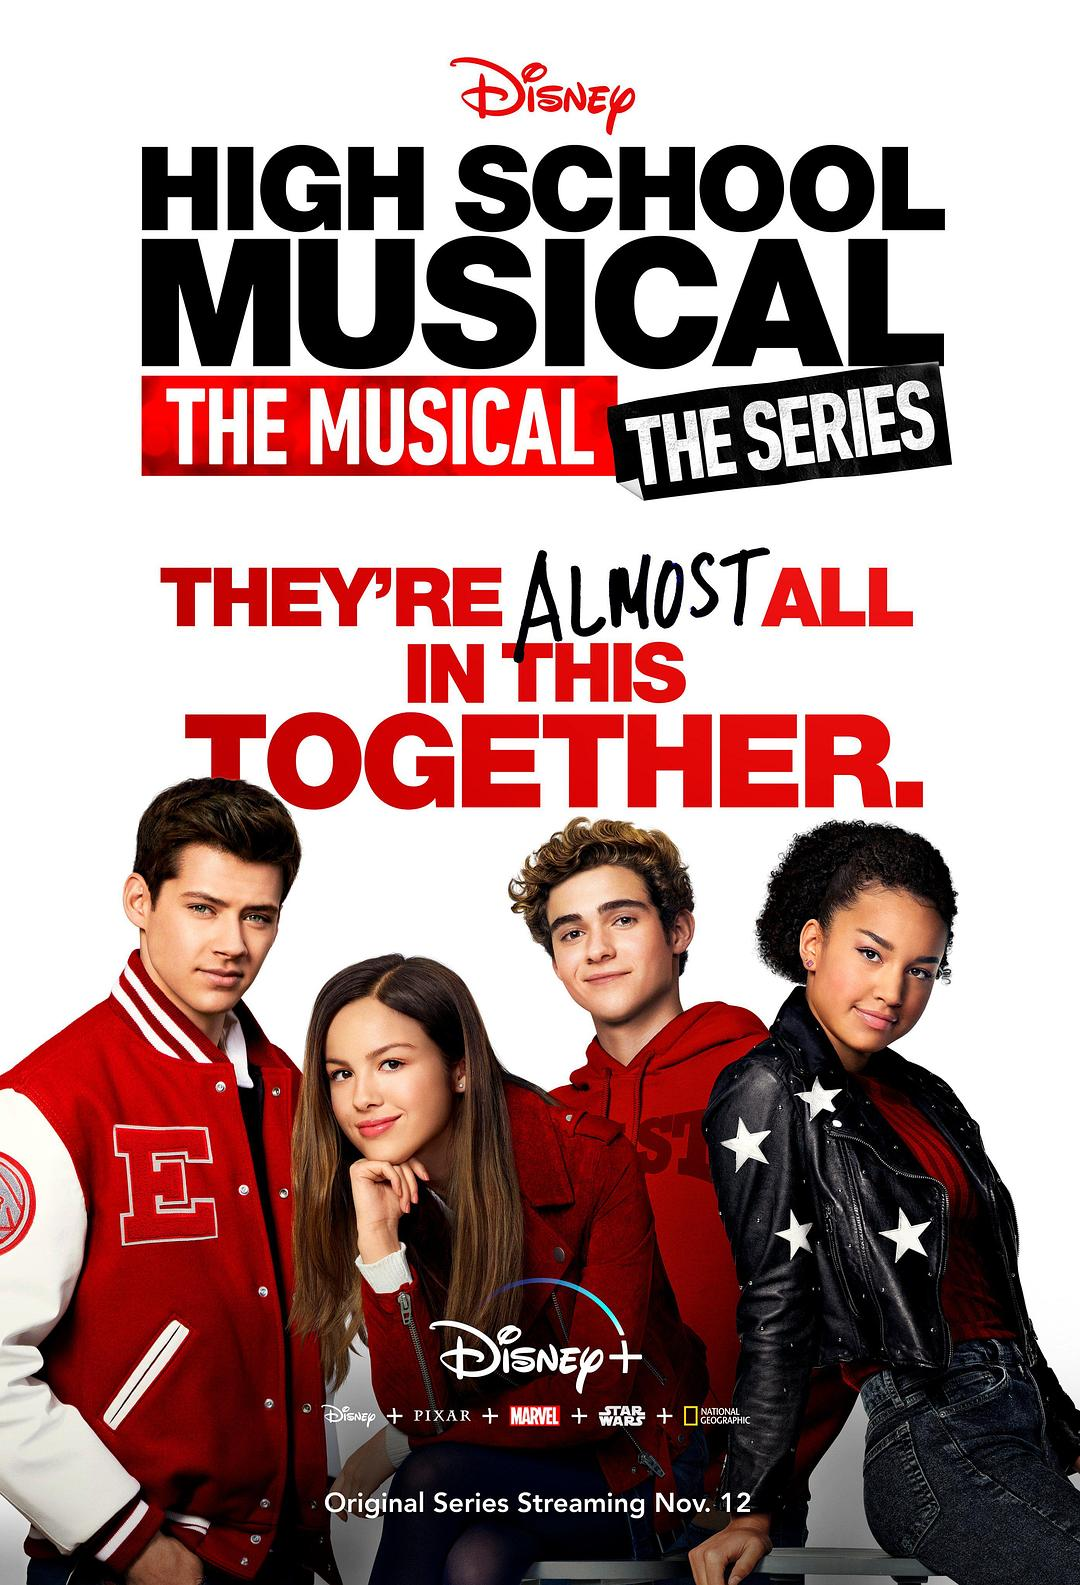 歌舞青春:音乐剧 High School Musical: The Musical